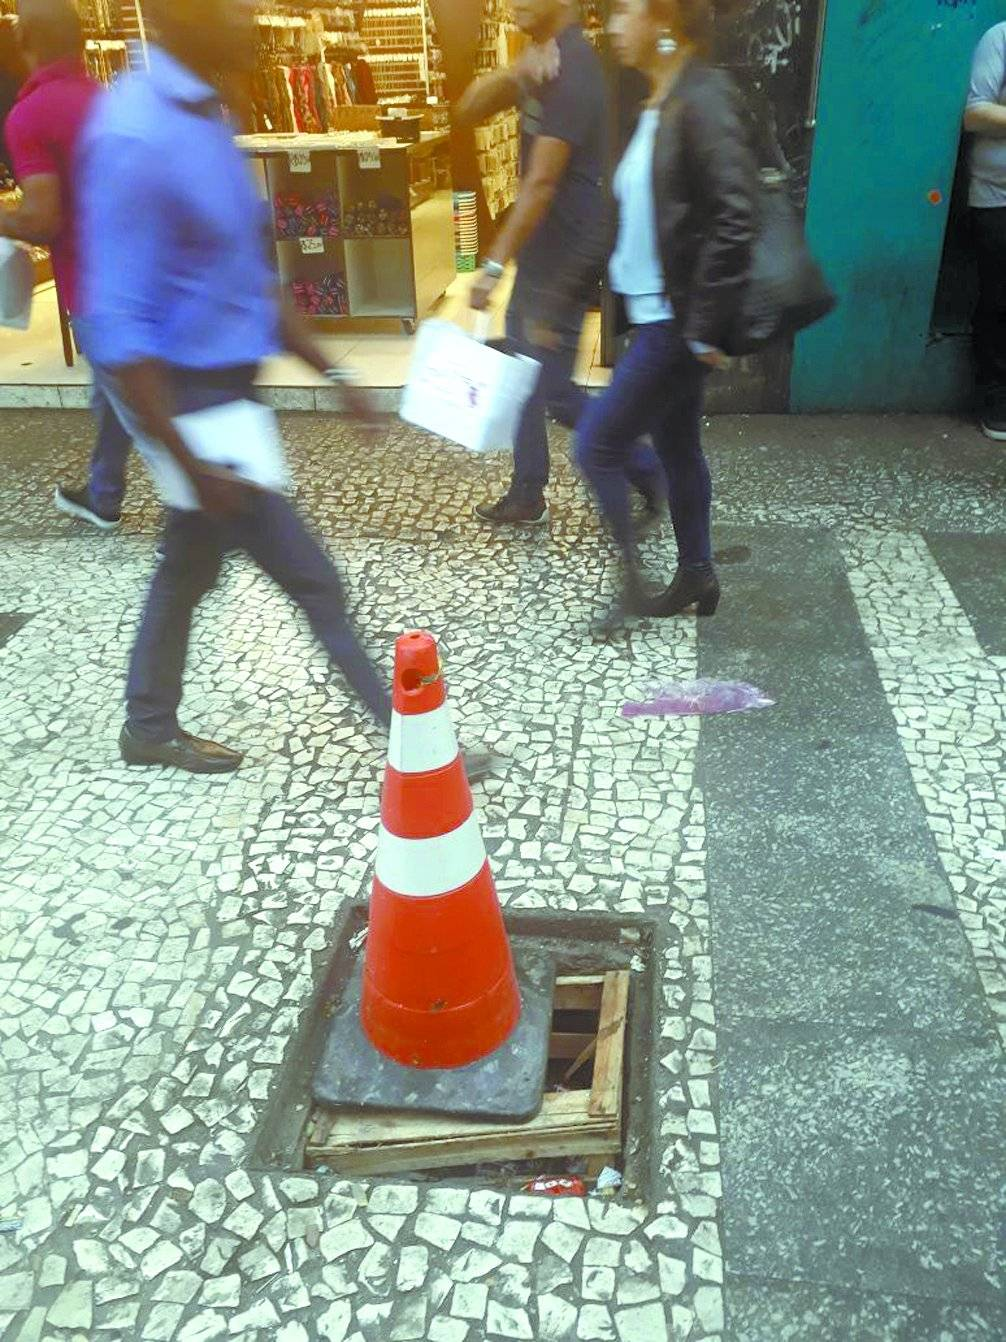 Bruna Martins/Metro